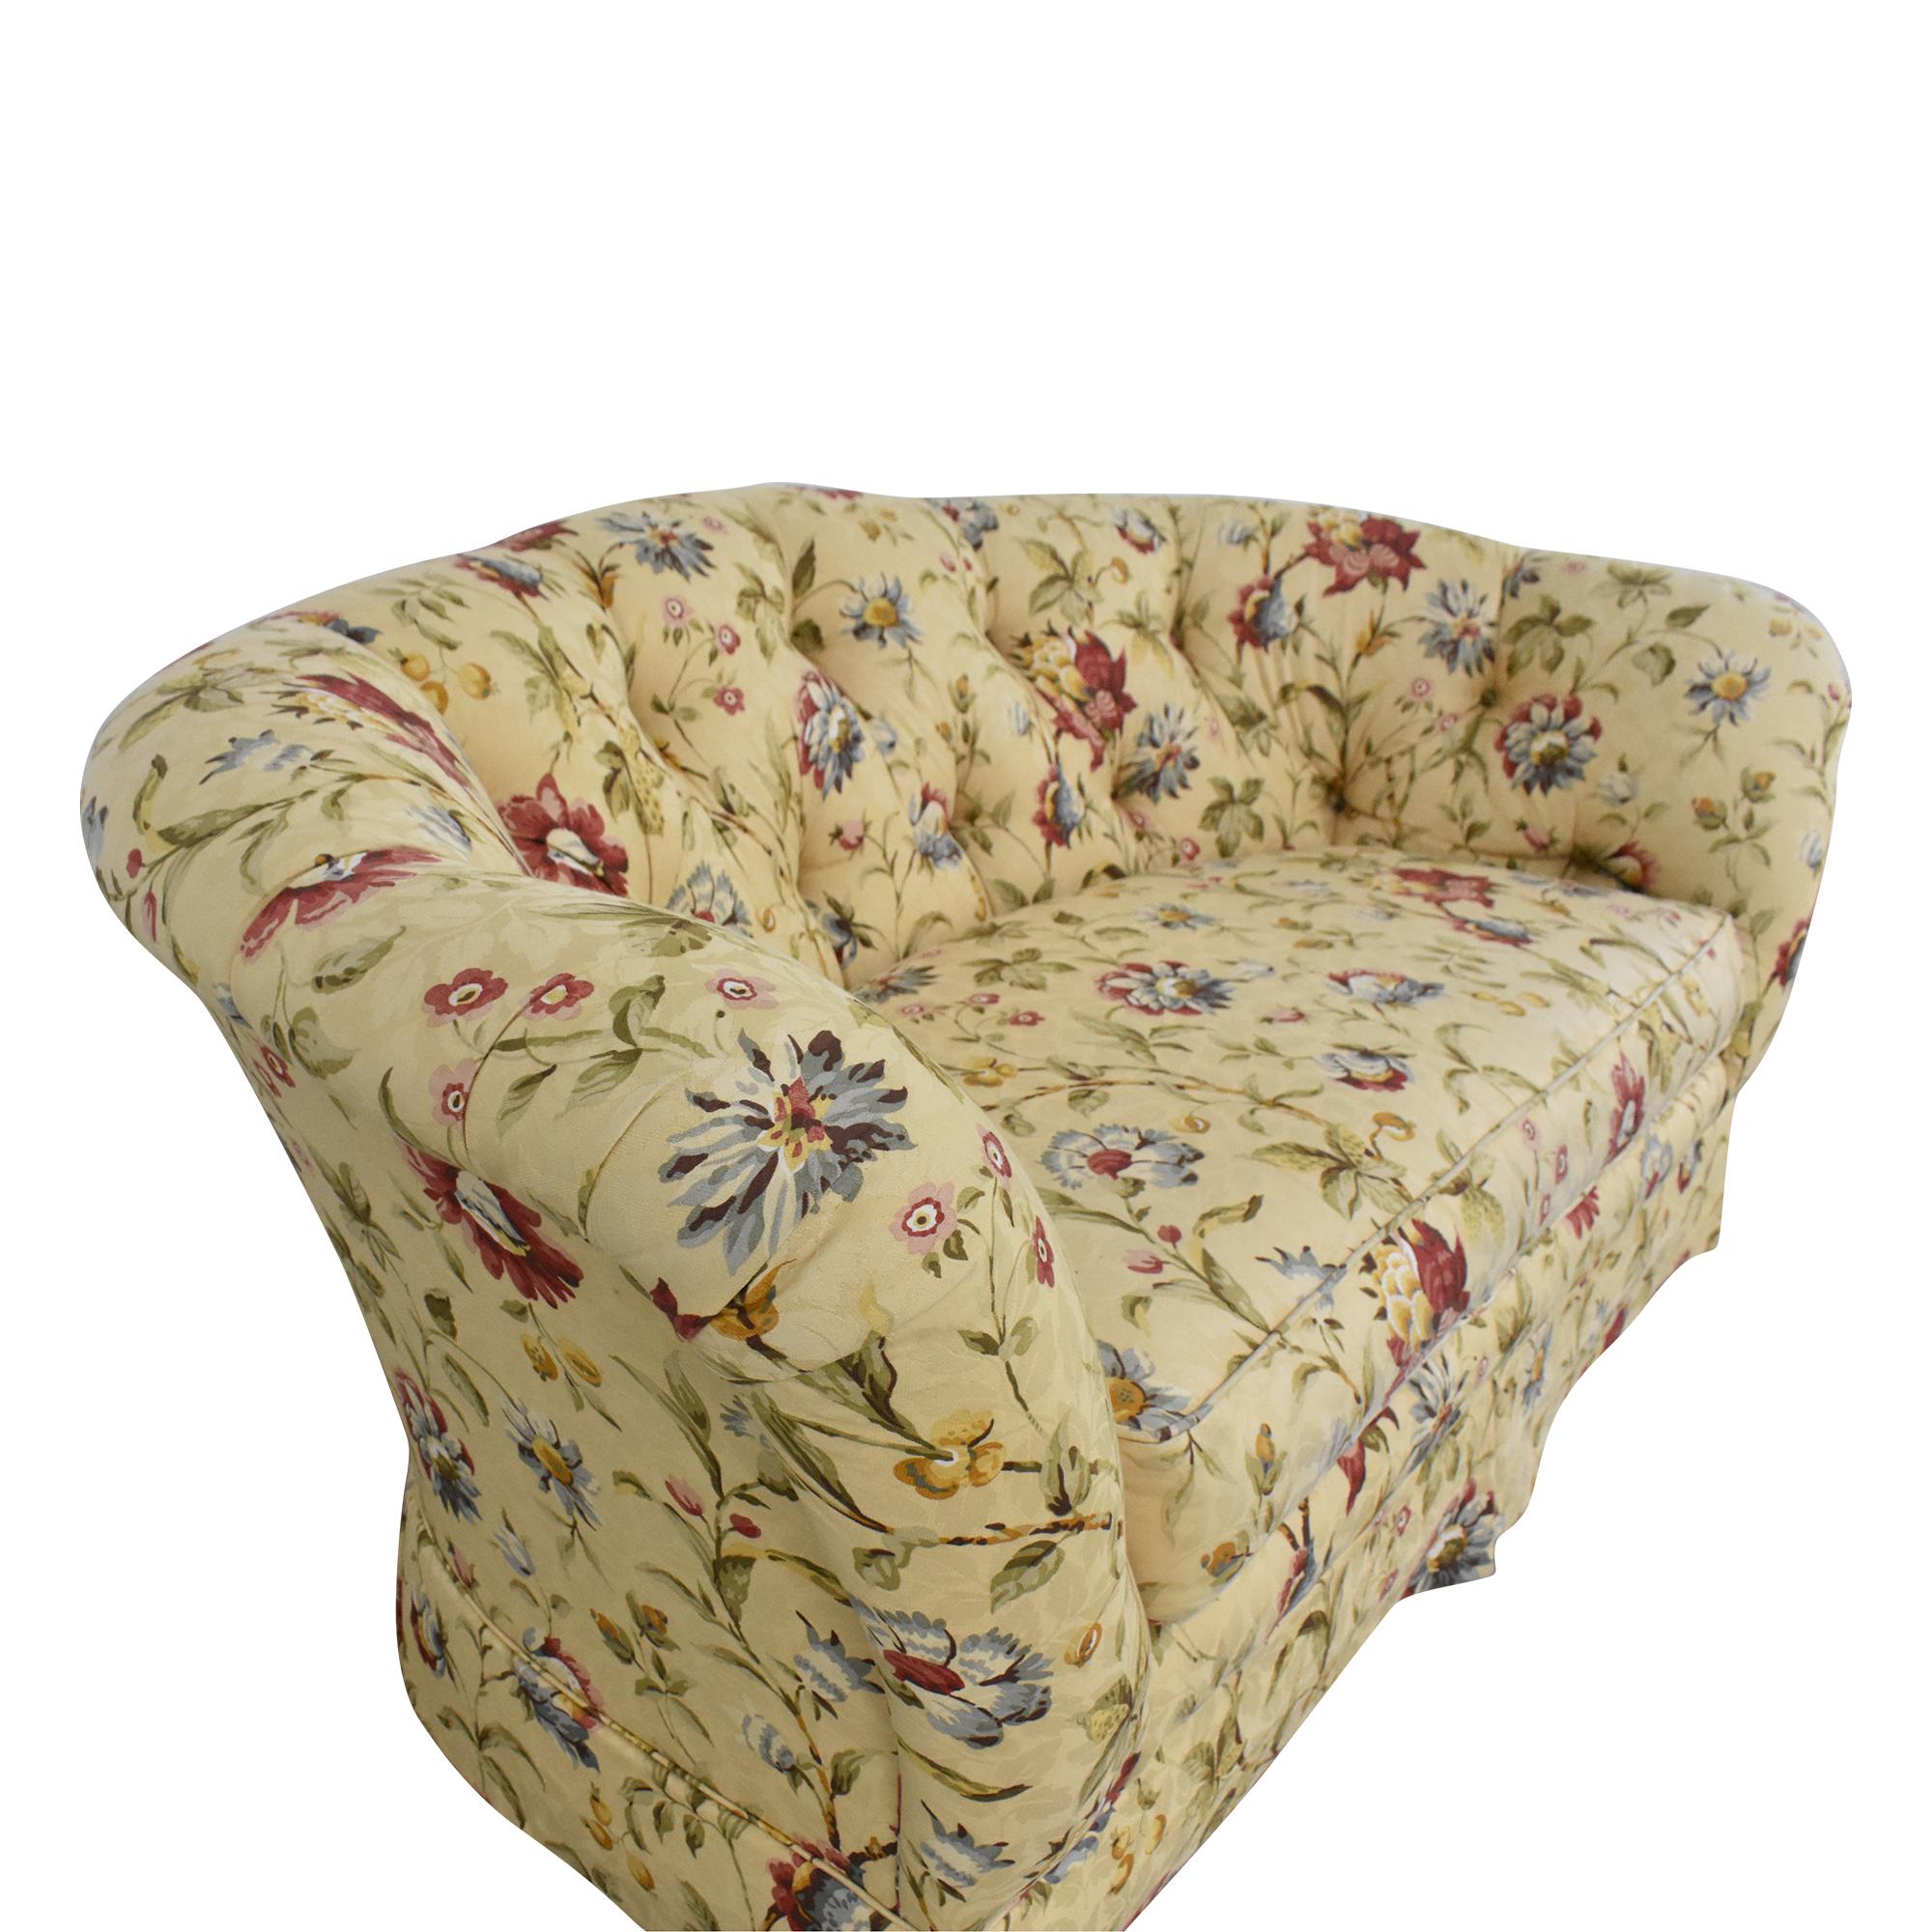 Ethan Allen Tufted Bench Cushion Sofa / Classic Sofas